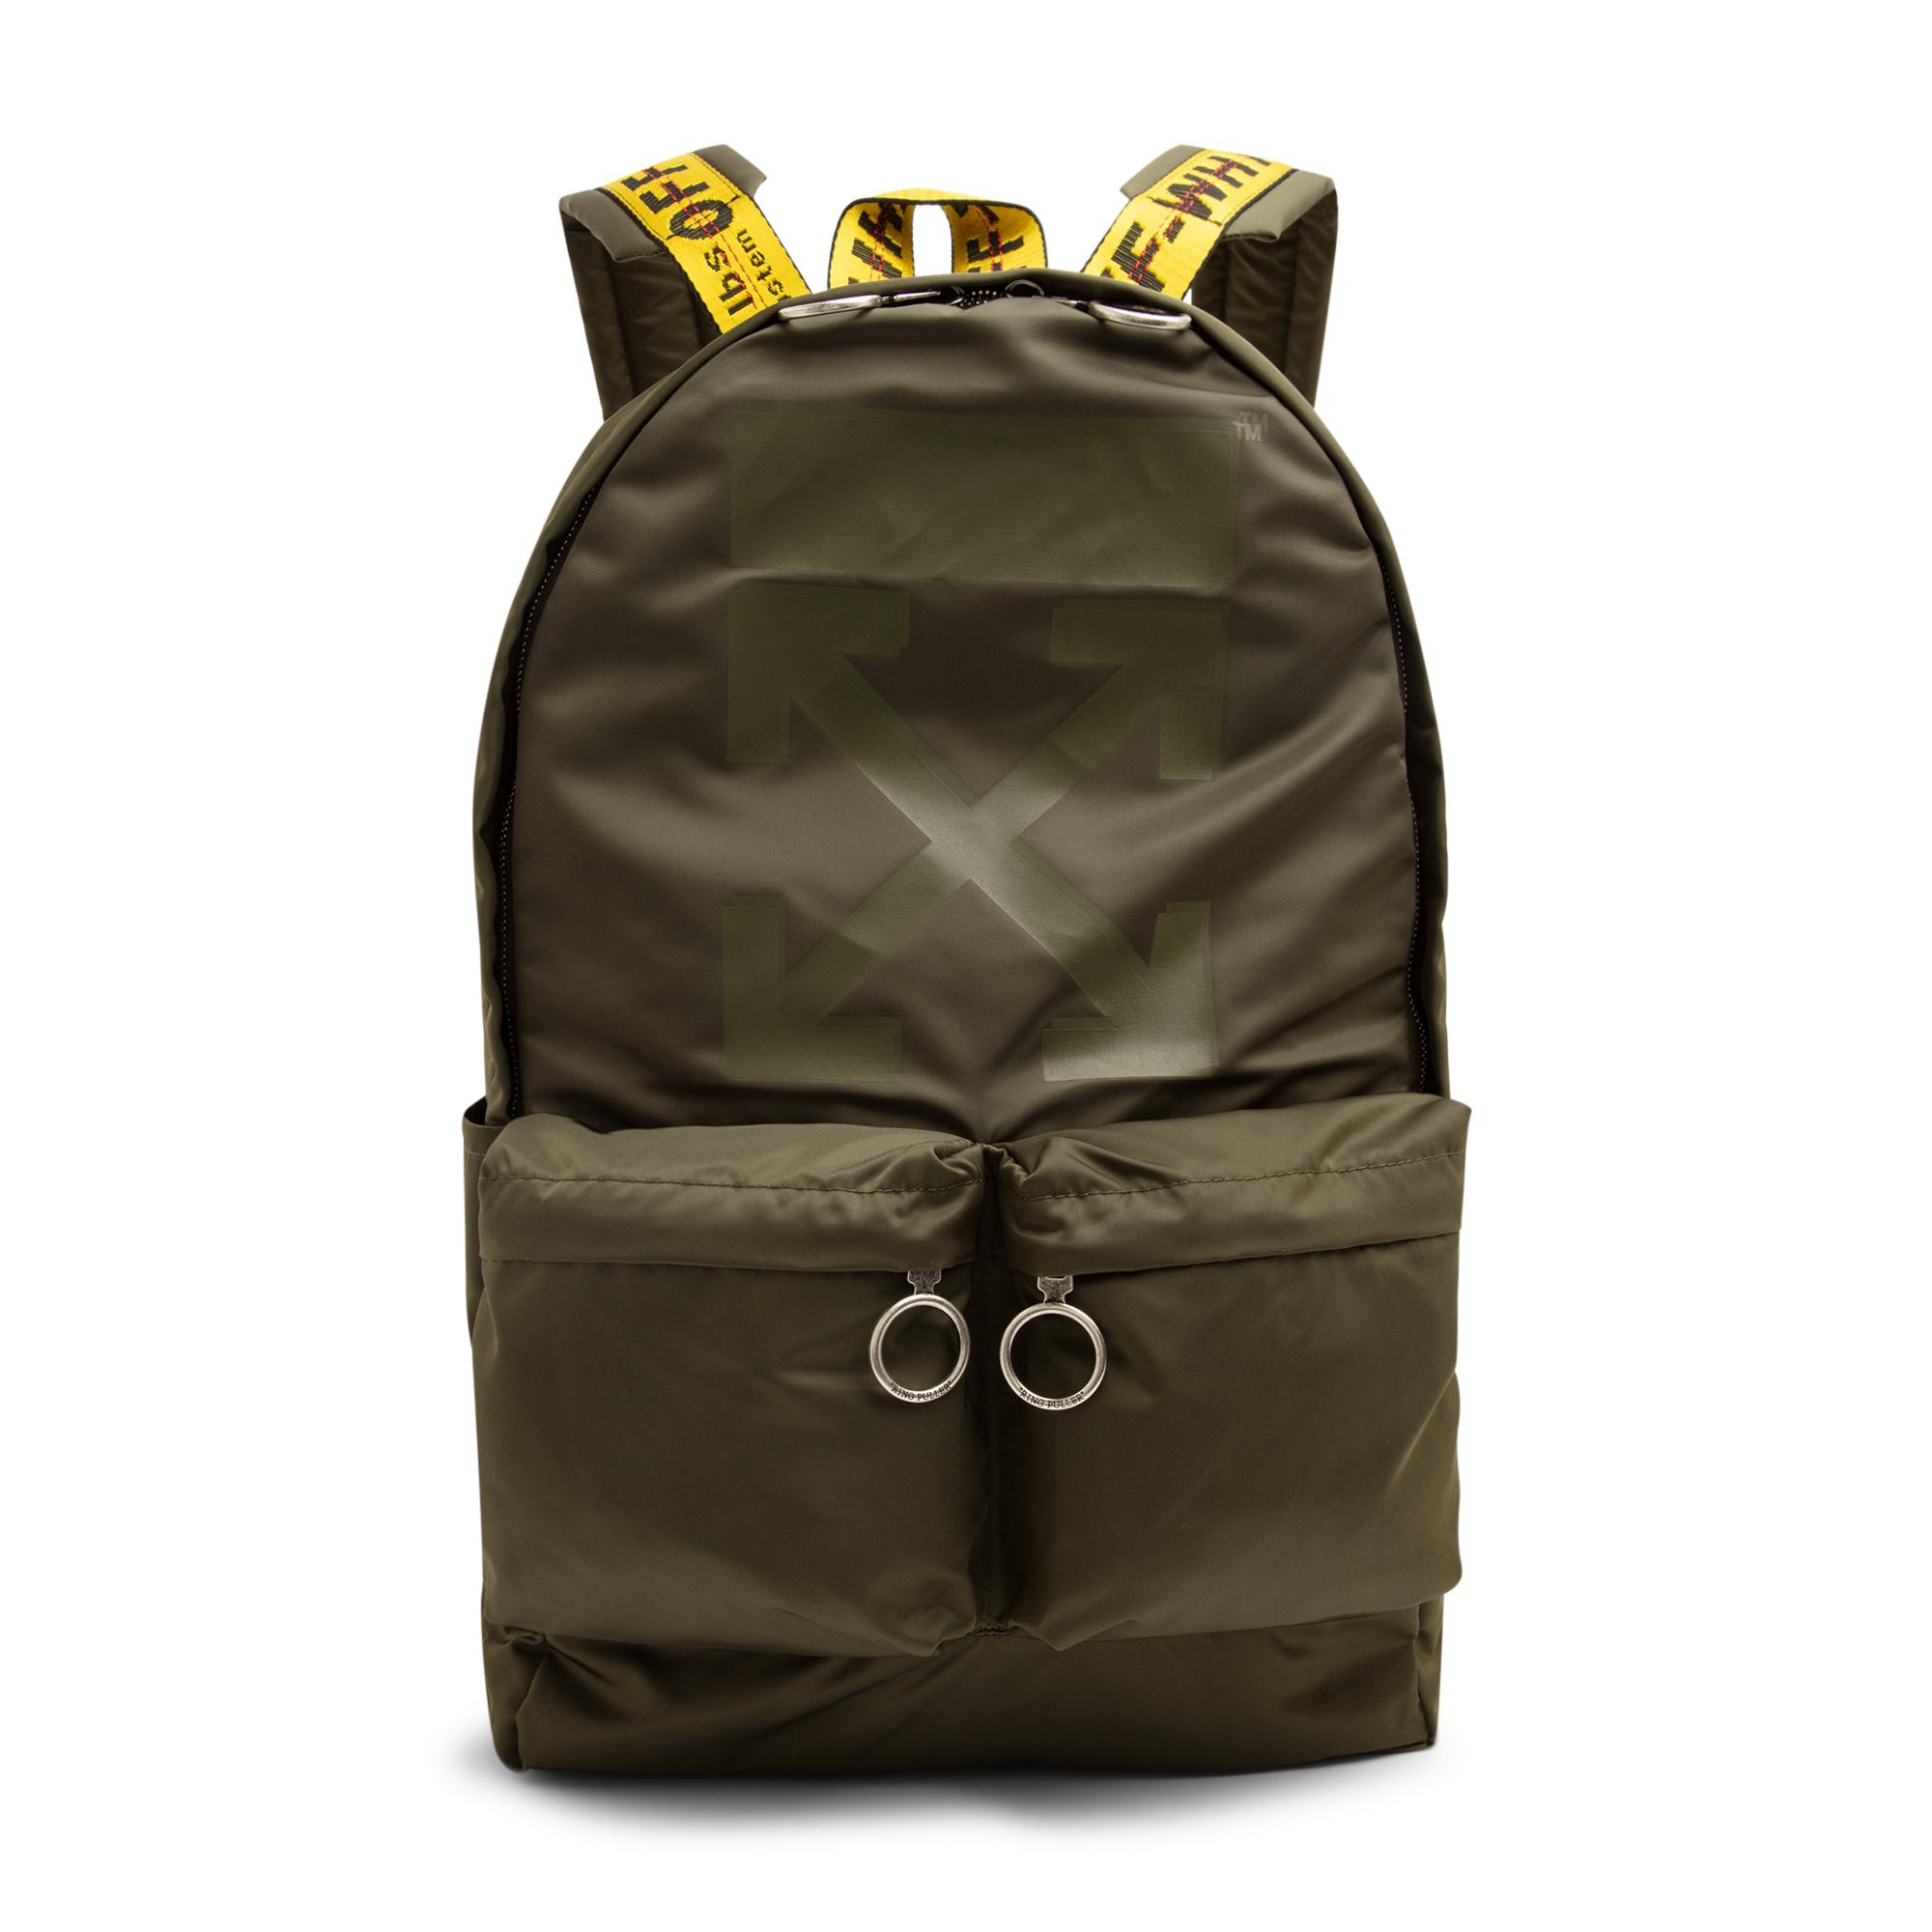 Rubber Arrow backpack